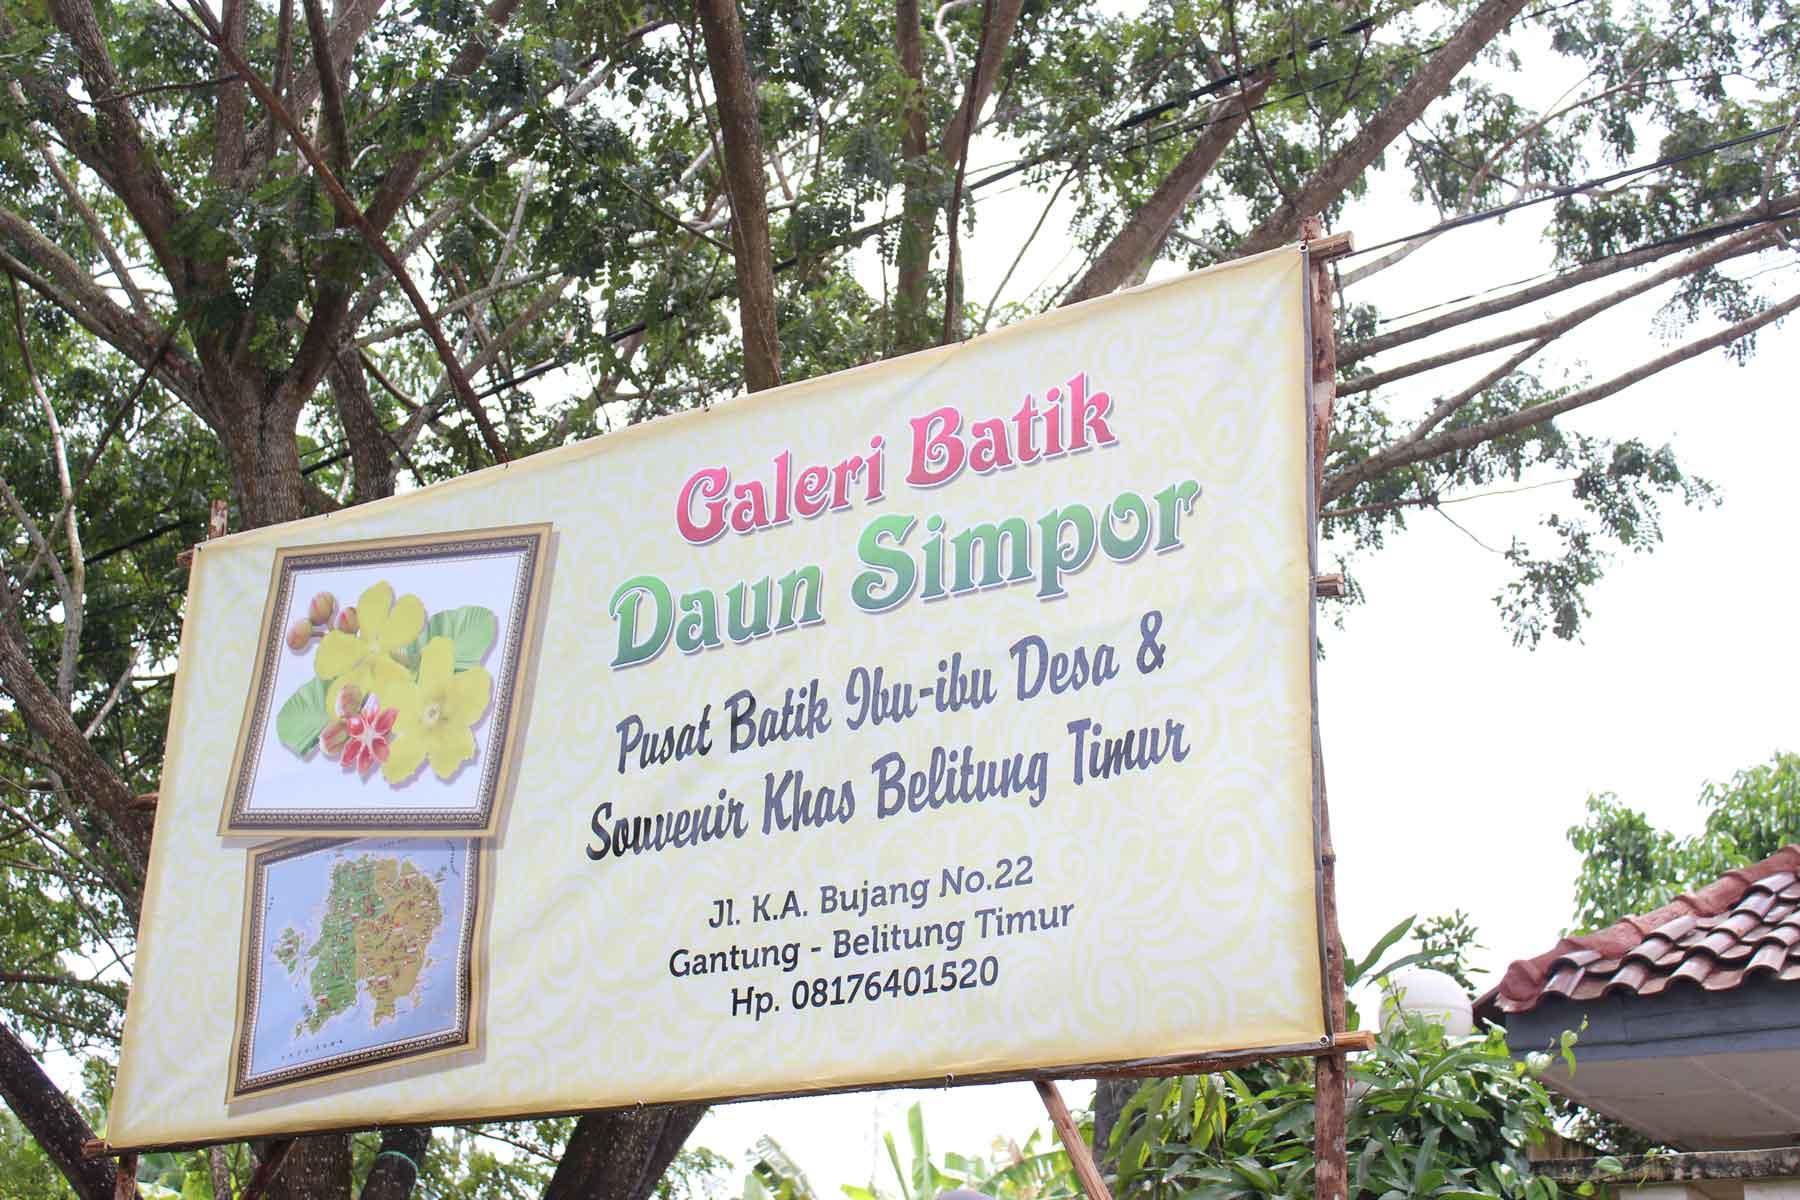 Souvenir Galeri Batik Daun Simpor